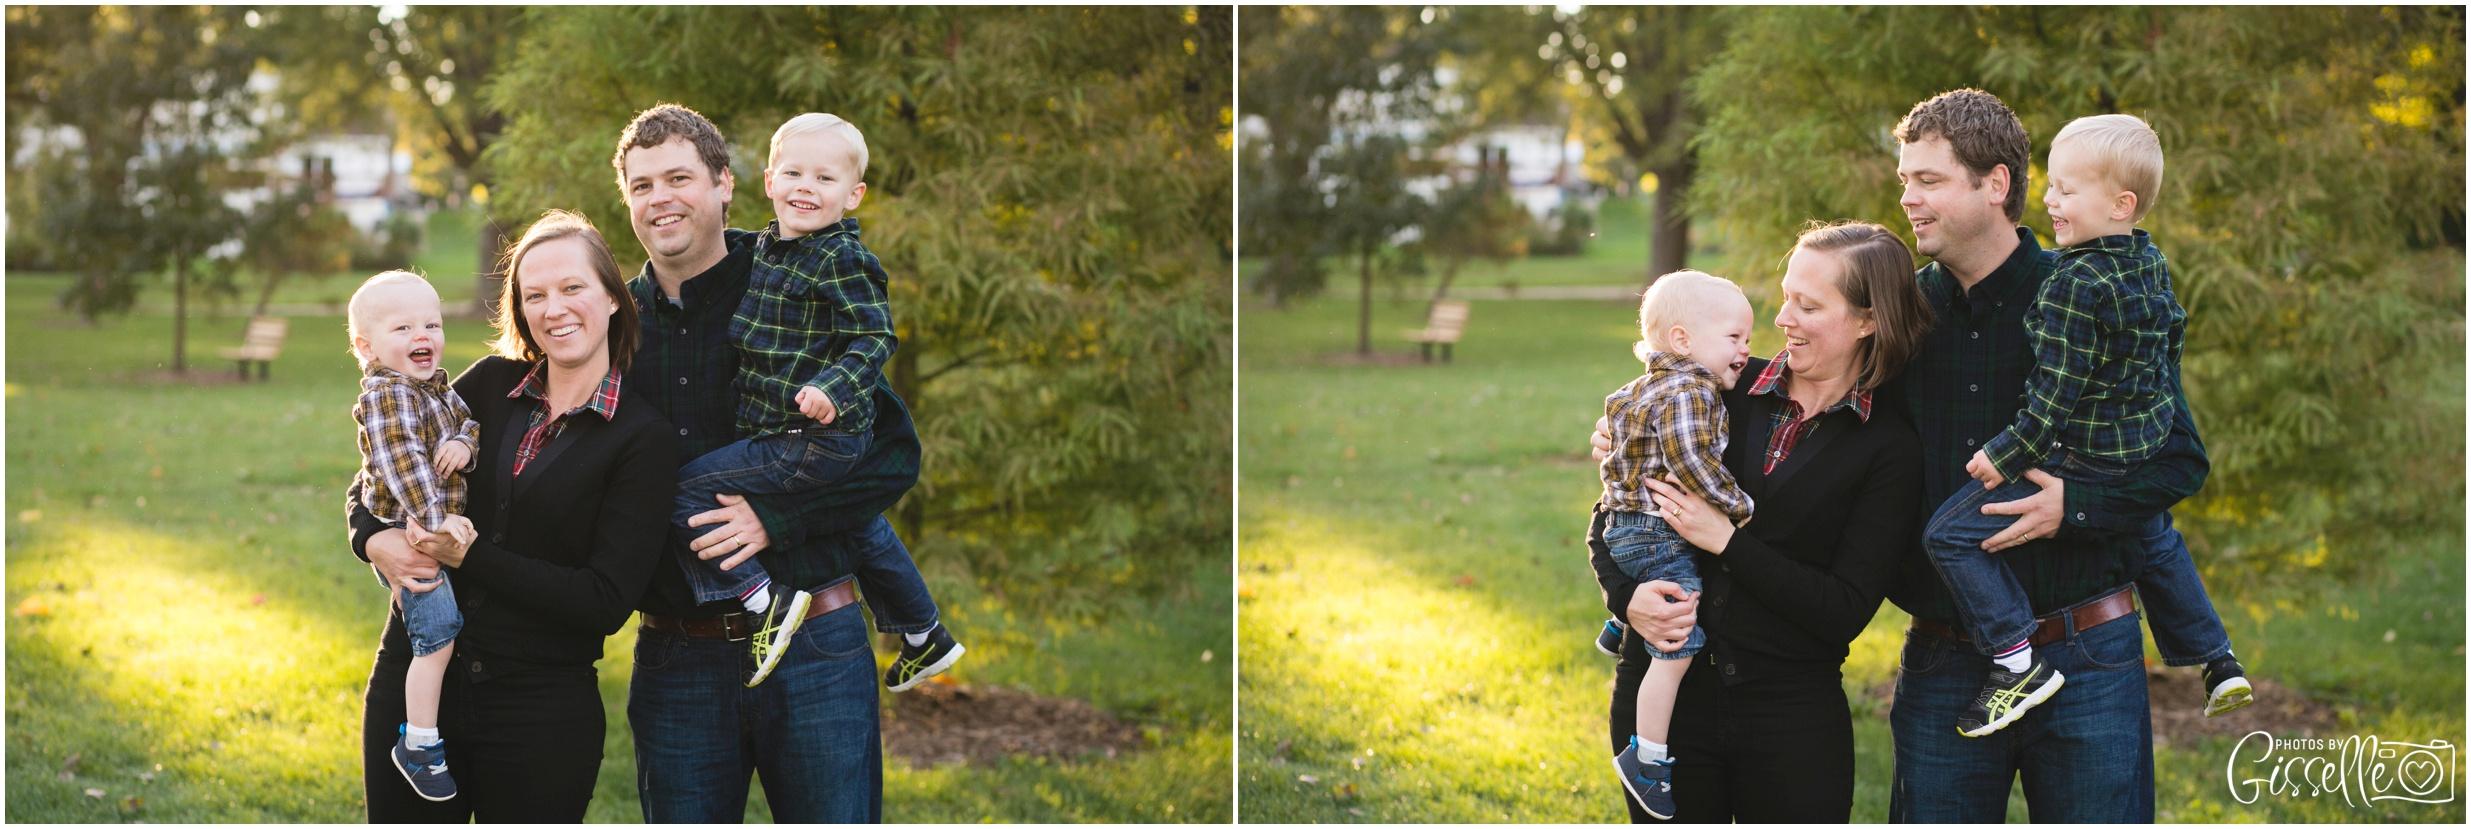 Wheaton Family Photography_0032.jpg